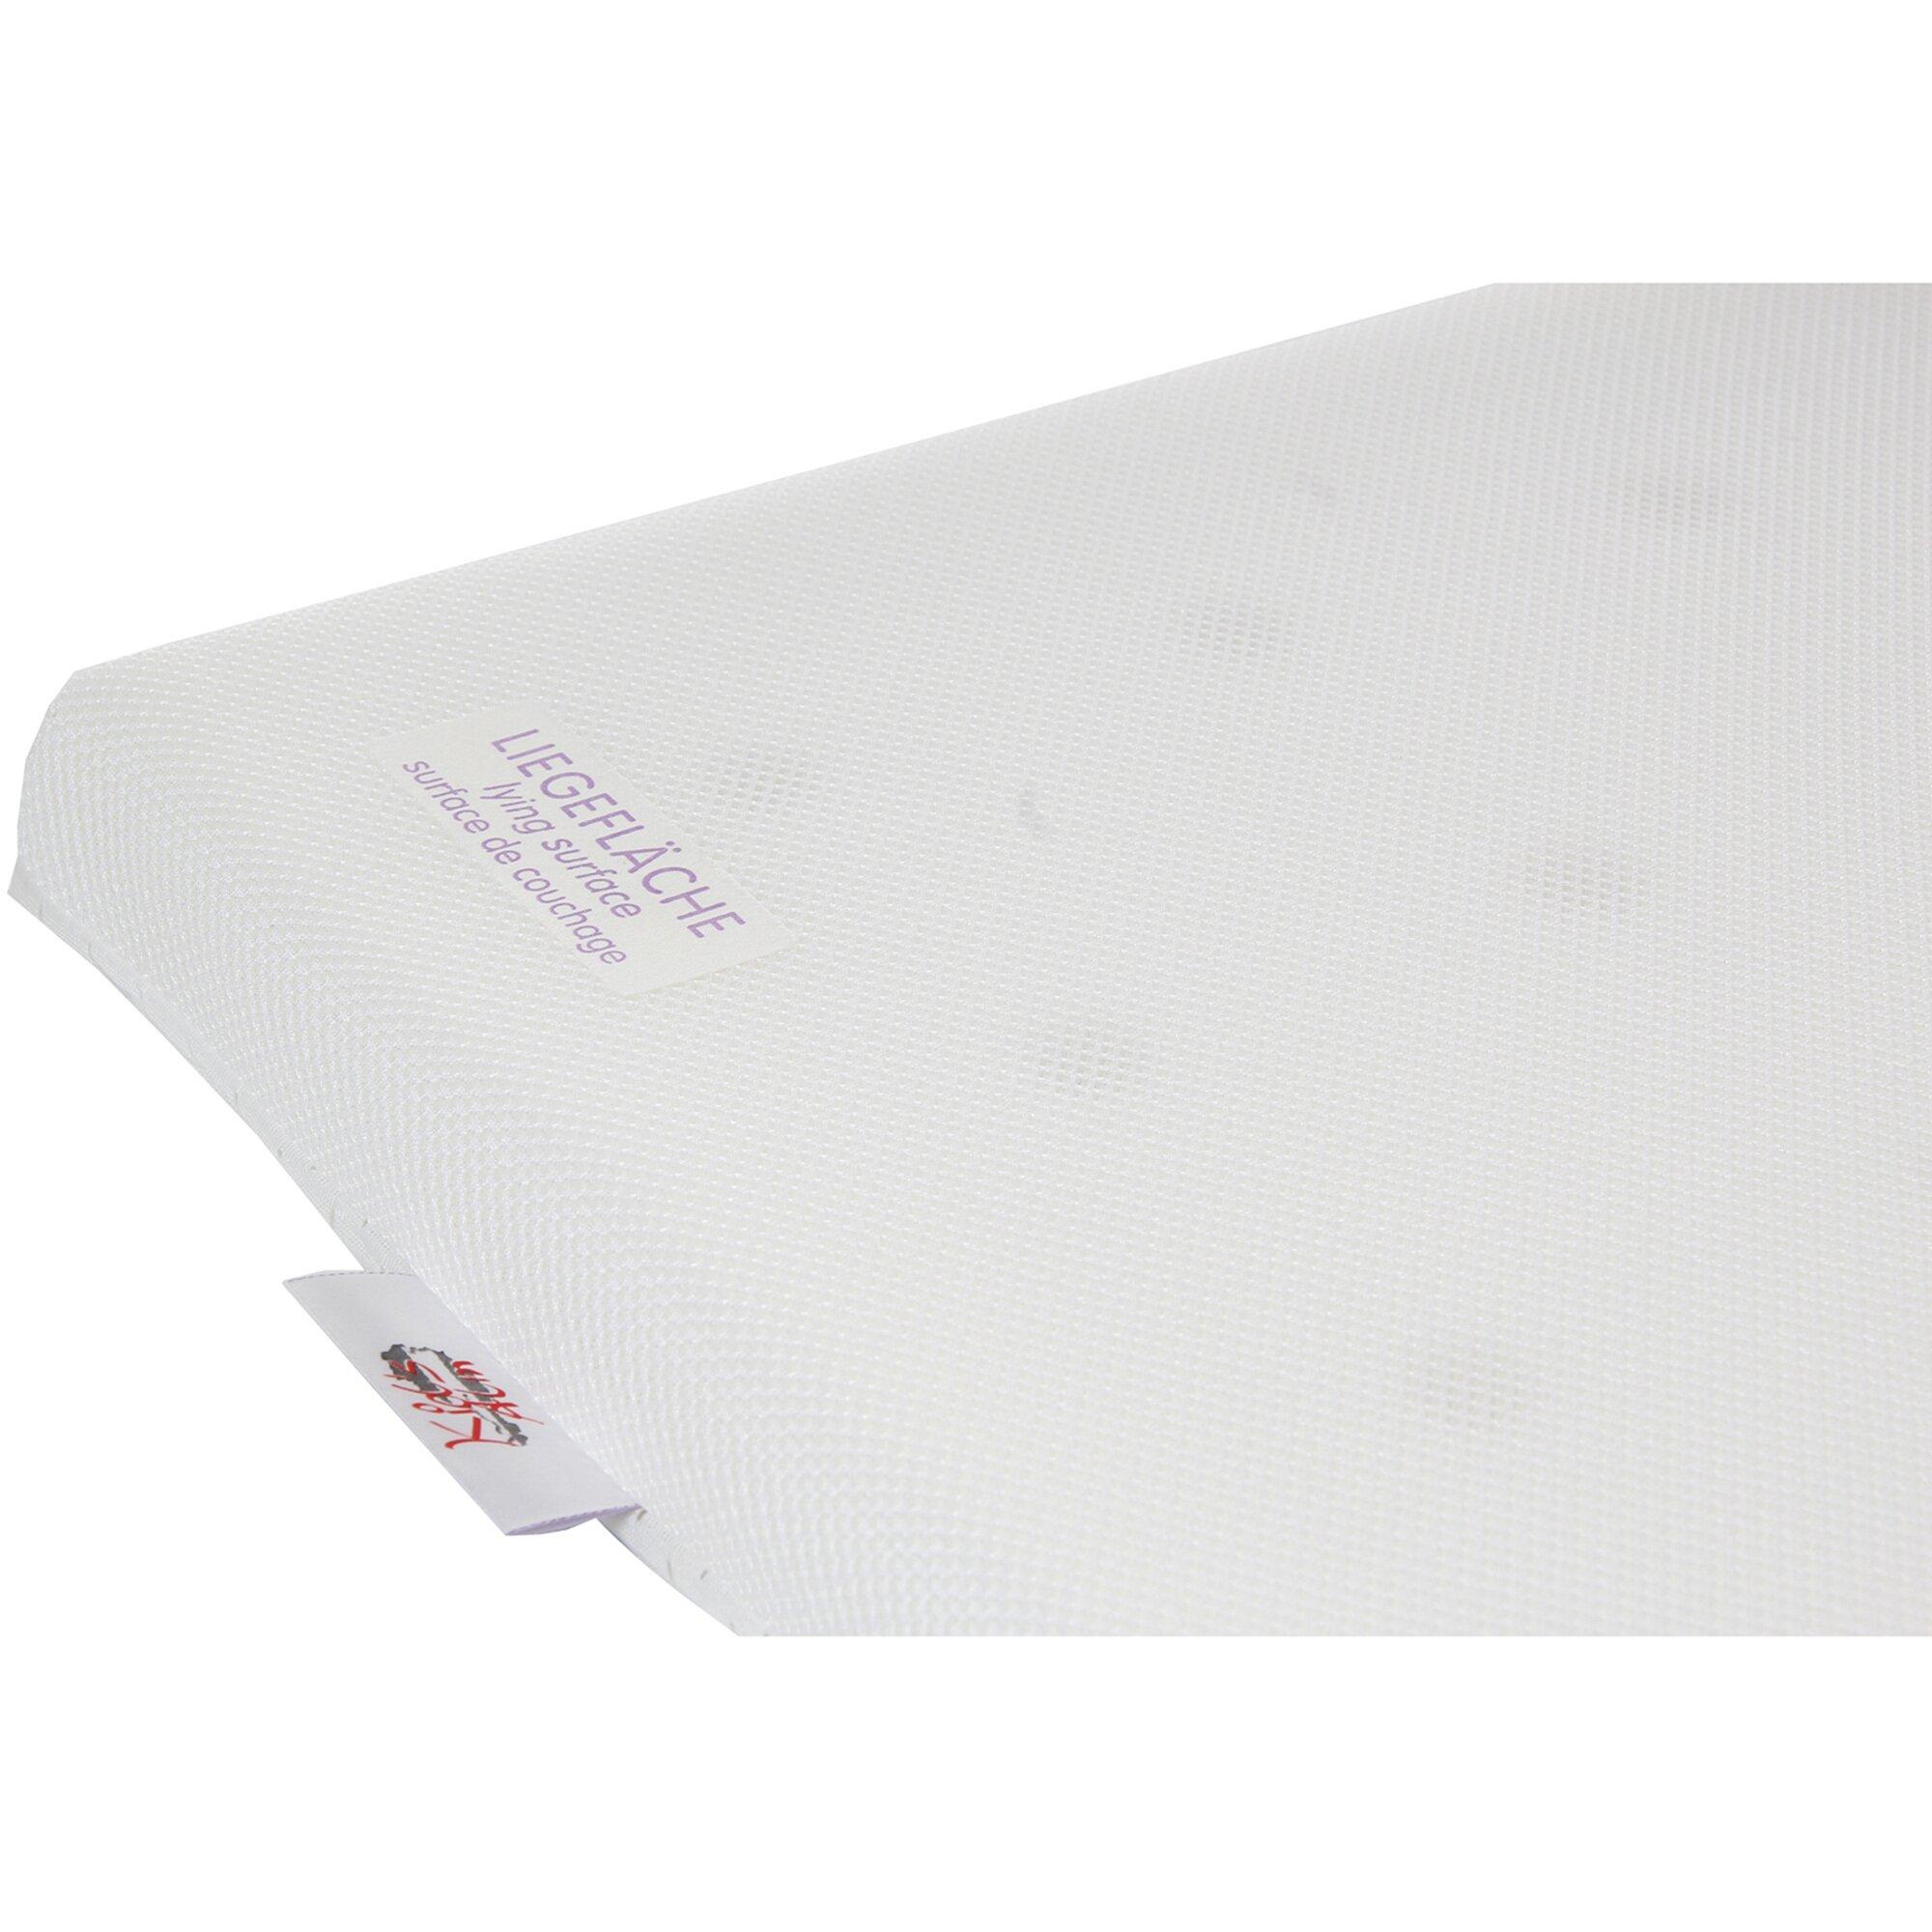 osann-reisebett-matratze-fresh-air-60x120-cm-gerollt